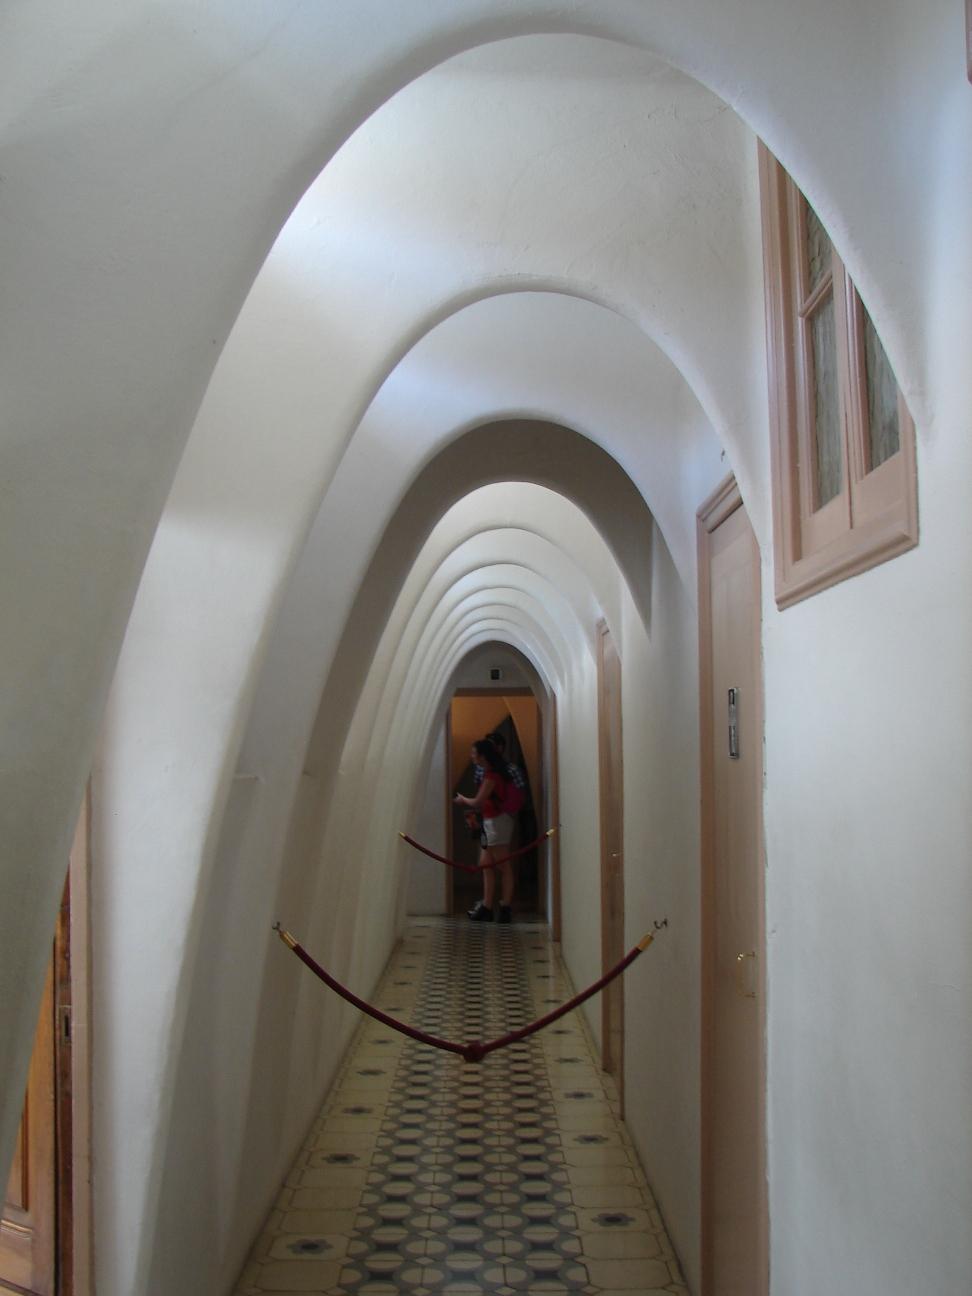 Casa Batlló - Arches 2